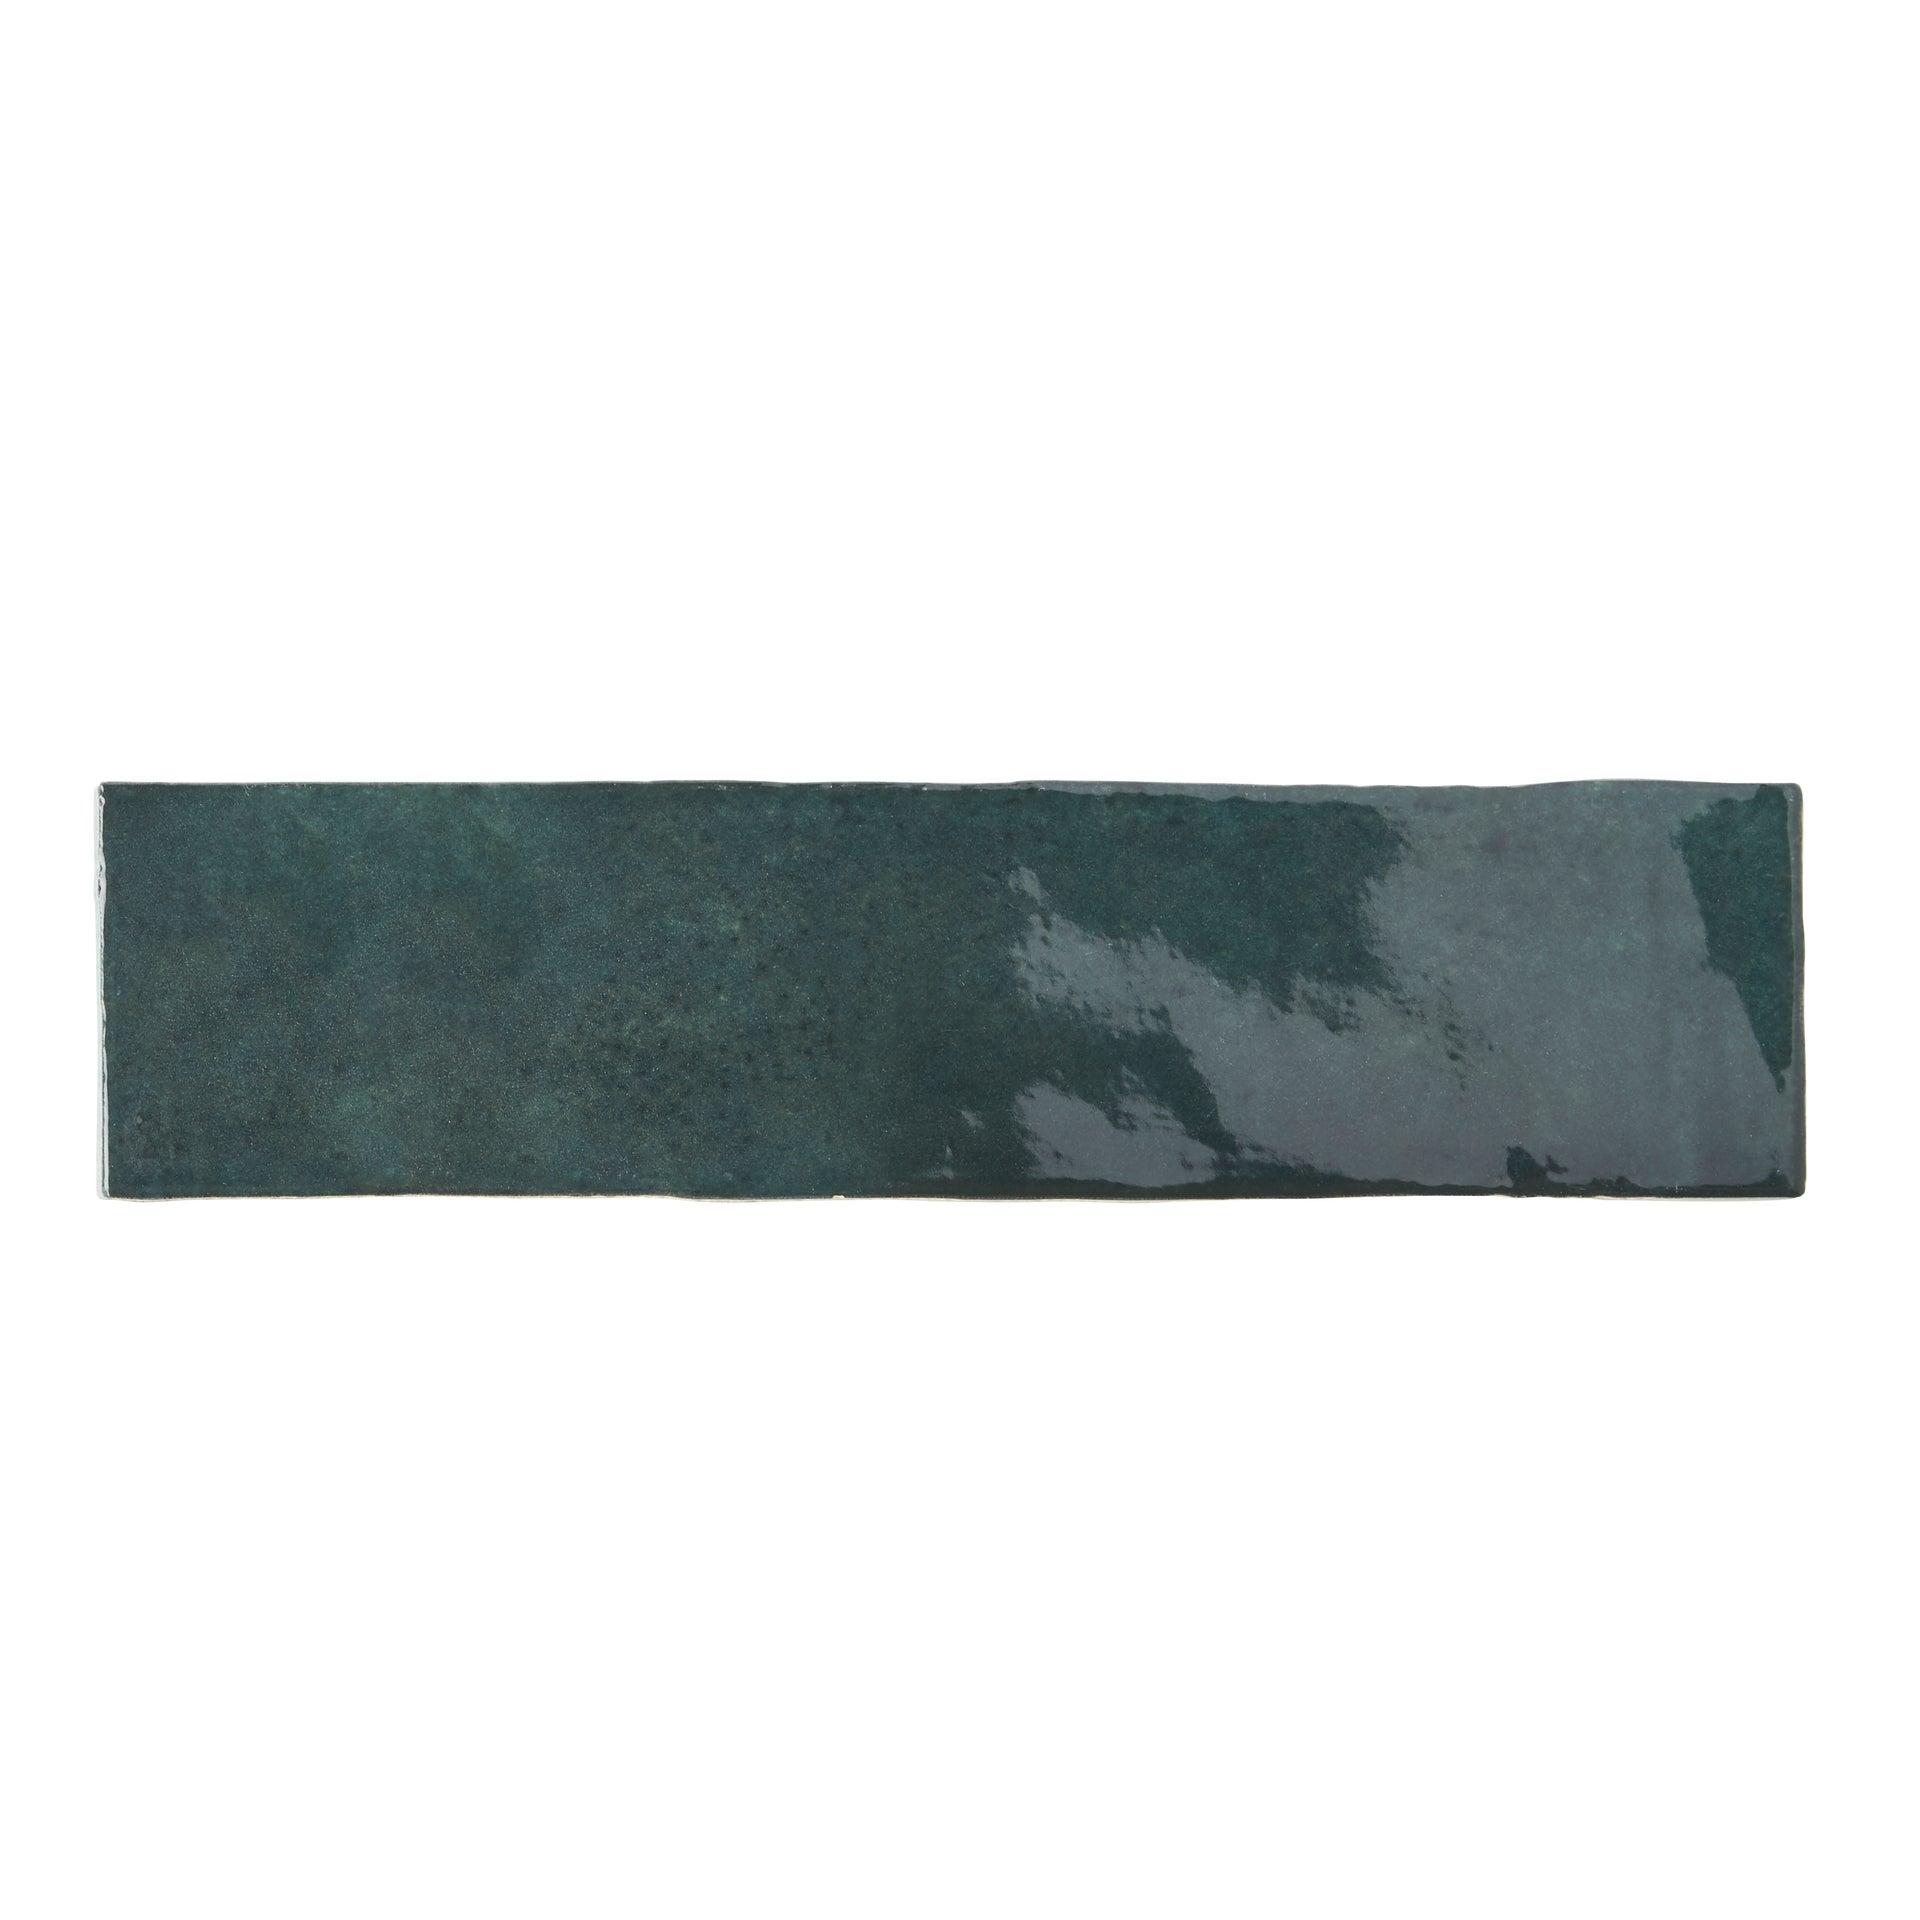 Carrelage Mur Forte Vert Fonce Brillant L 7 5 X L 30 Cm Bakerstreet Leroy Merlin